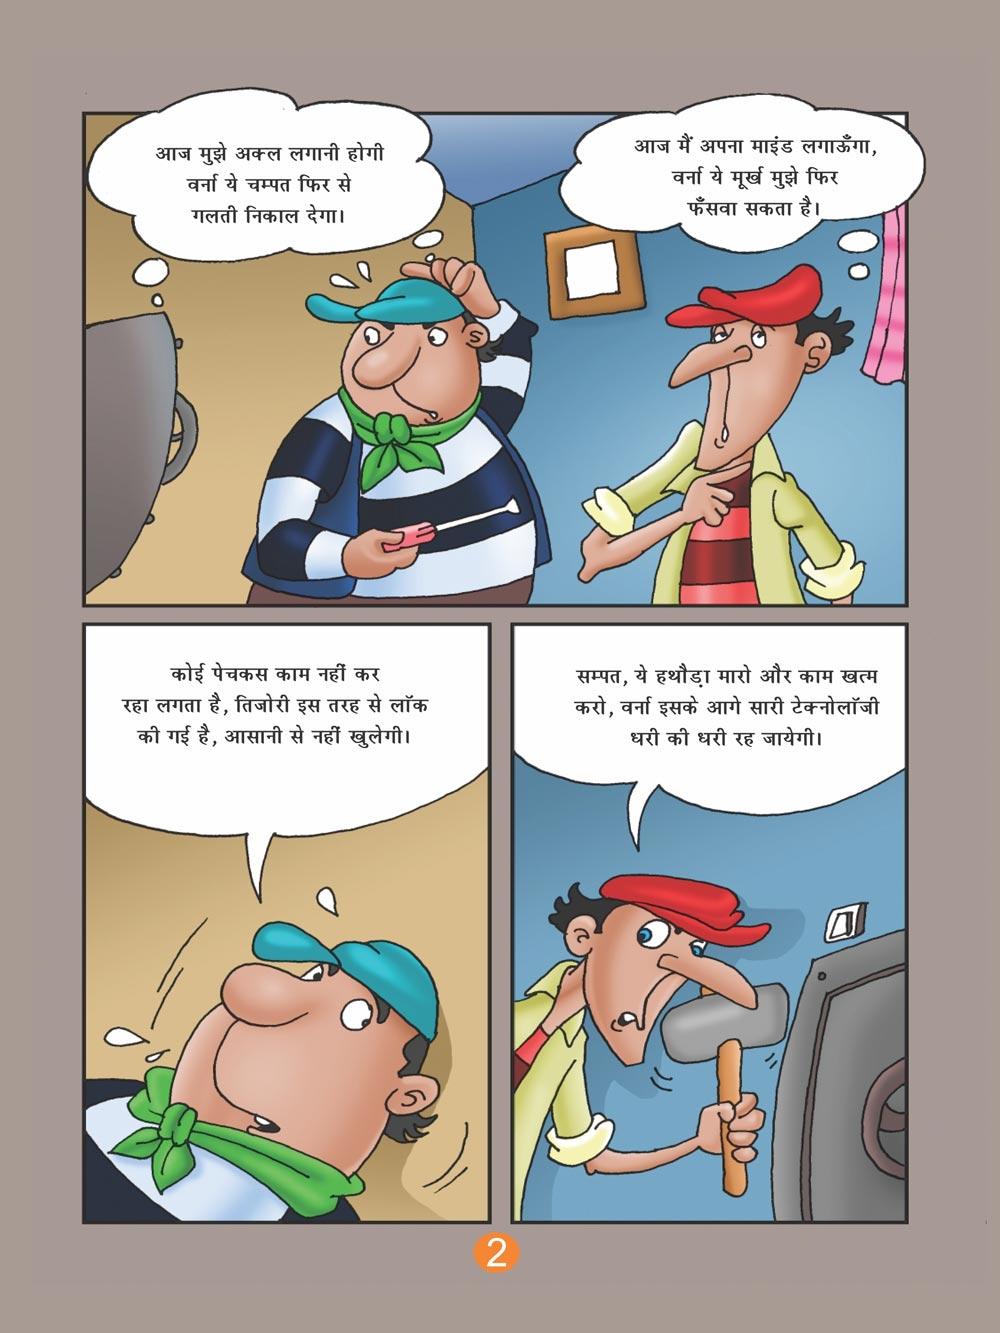 Lotpot Comics The adventures of Champat Sampat